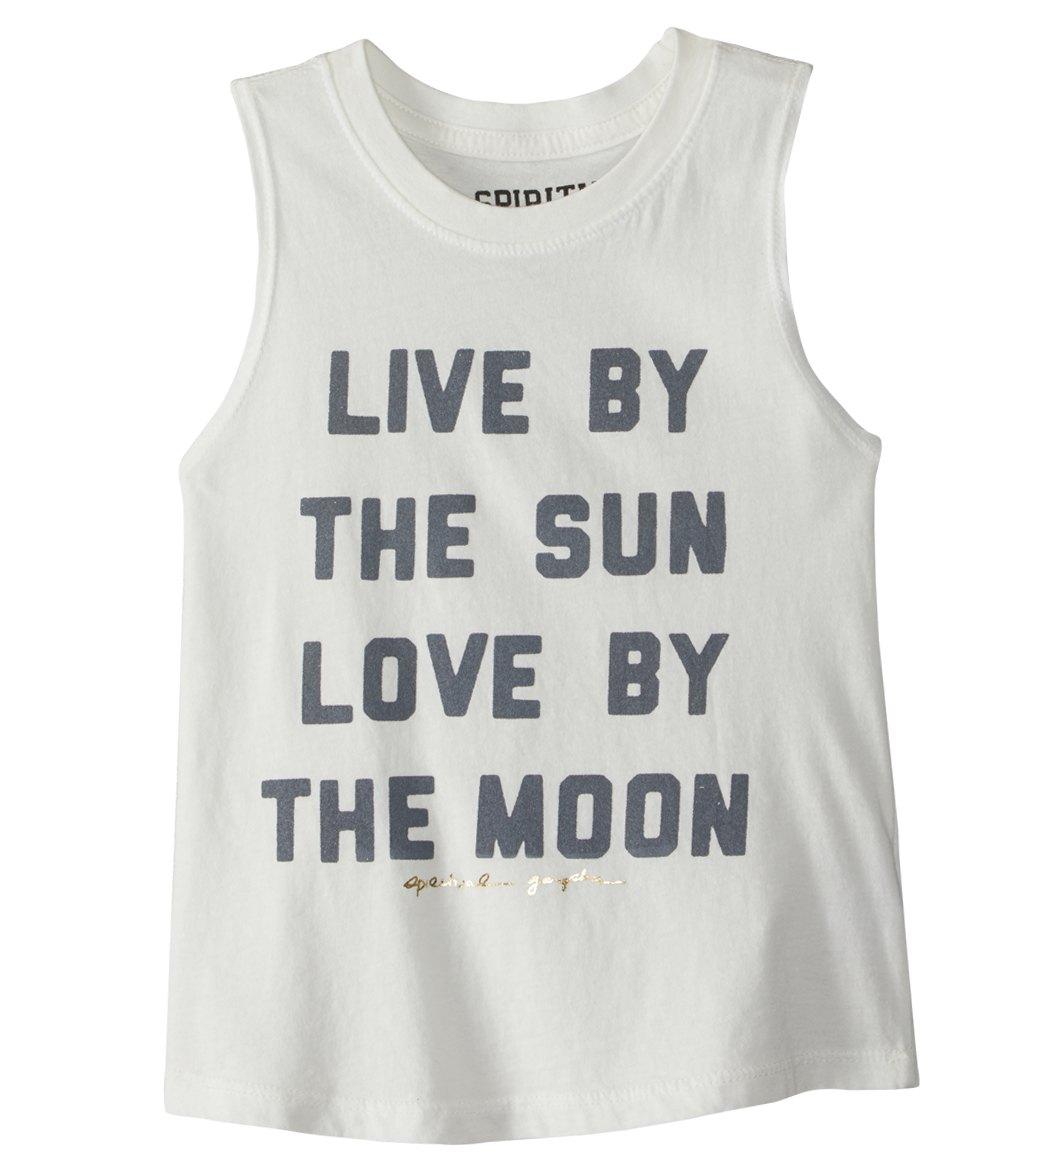 love-by-the-moon.jpg